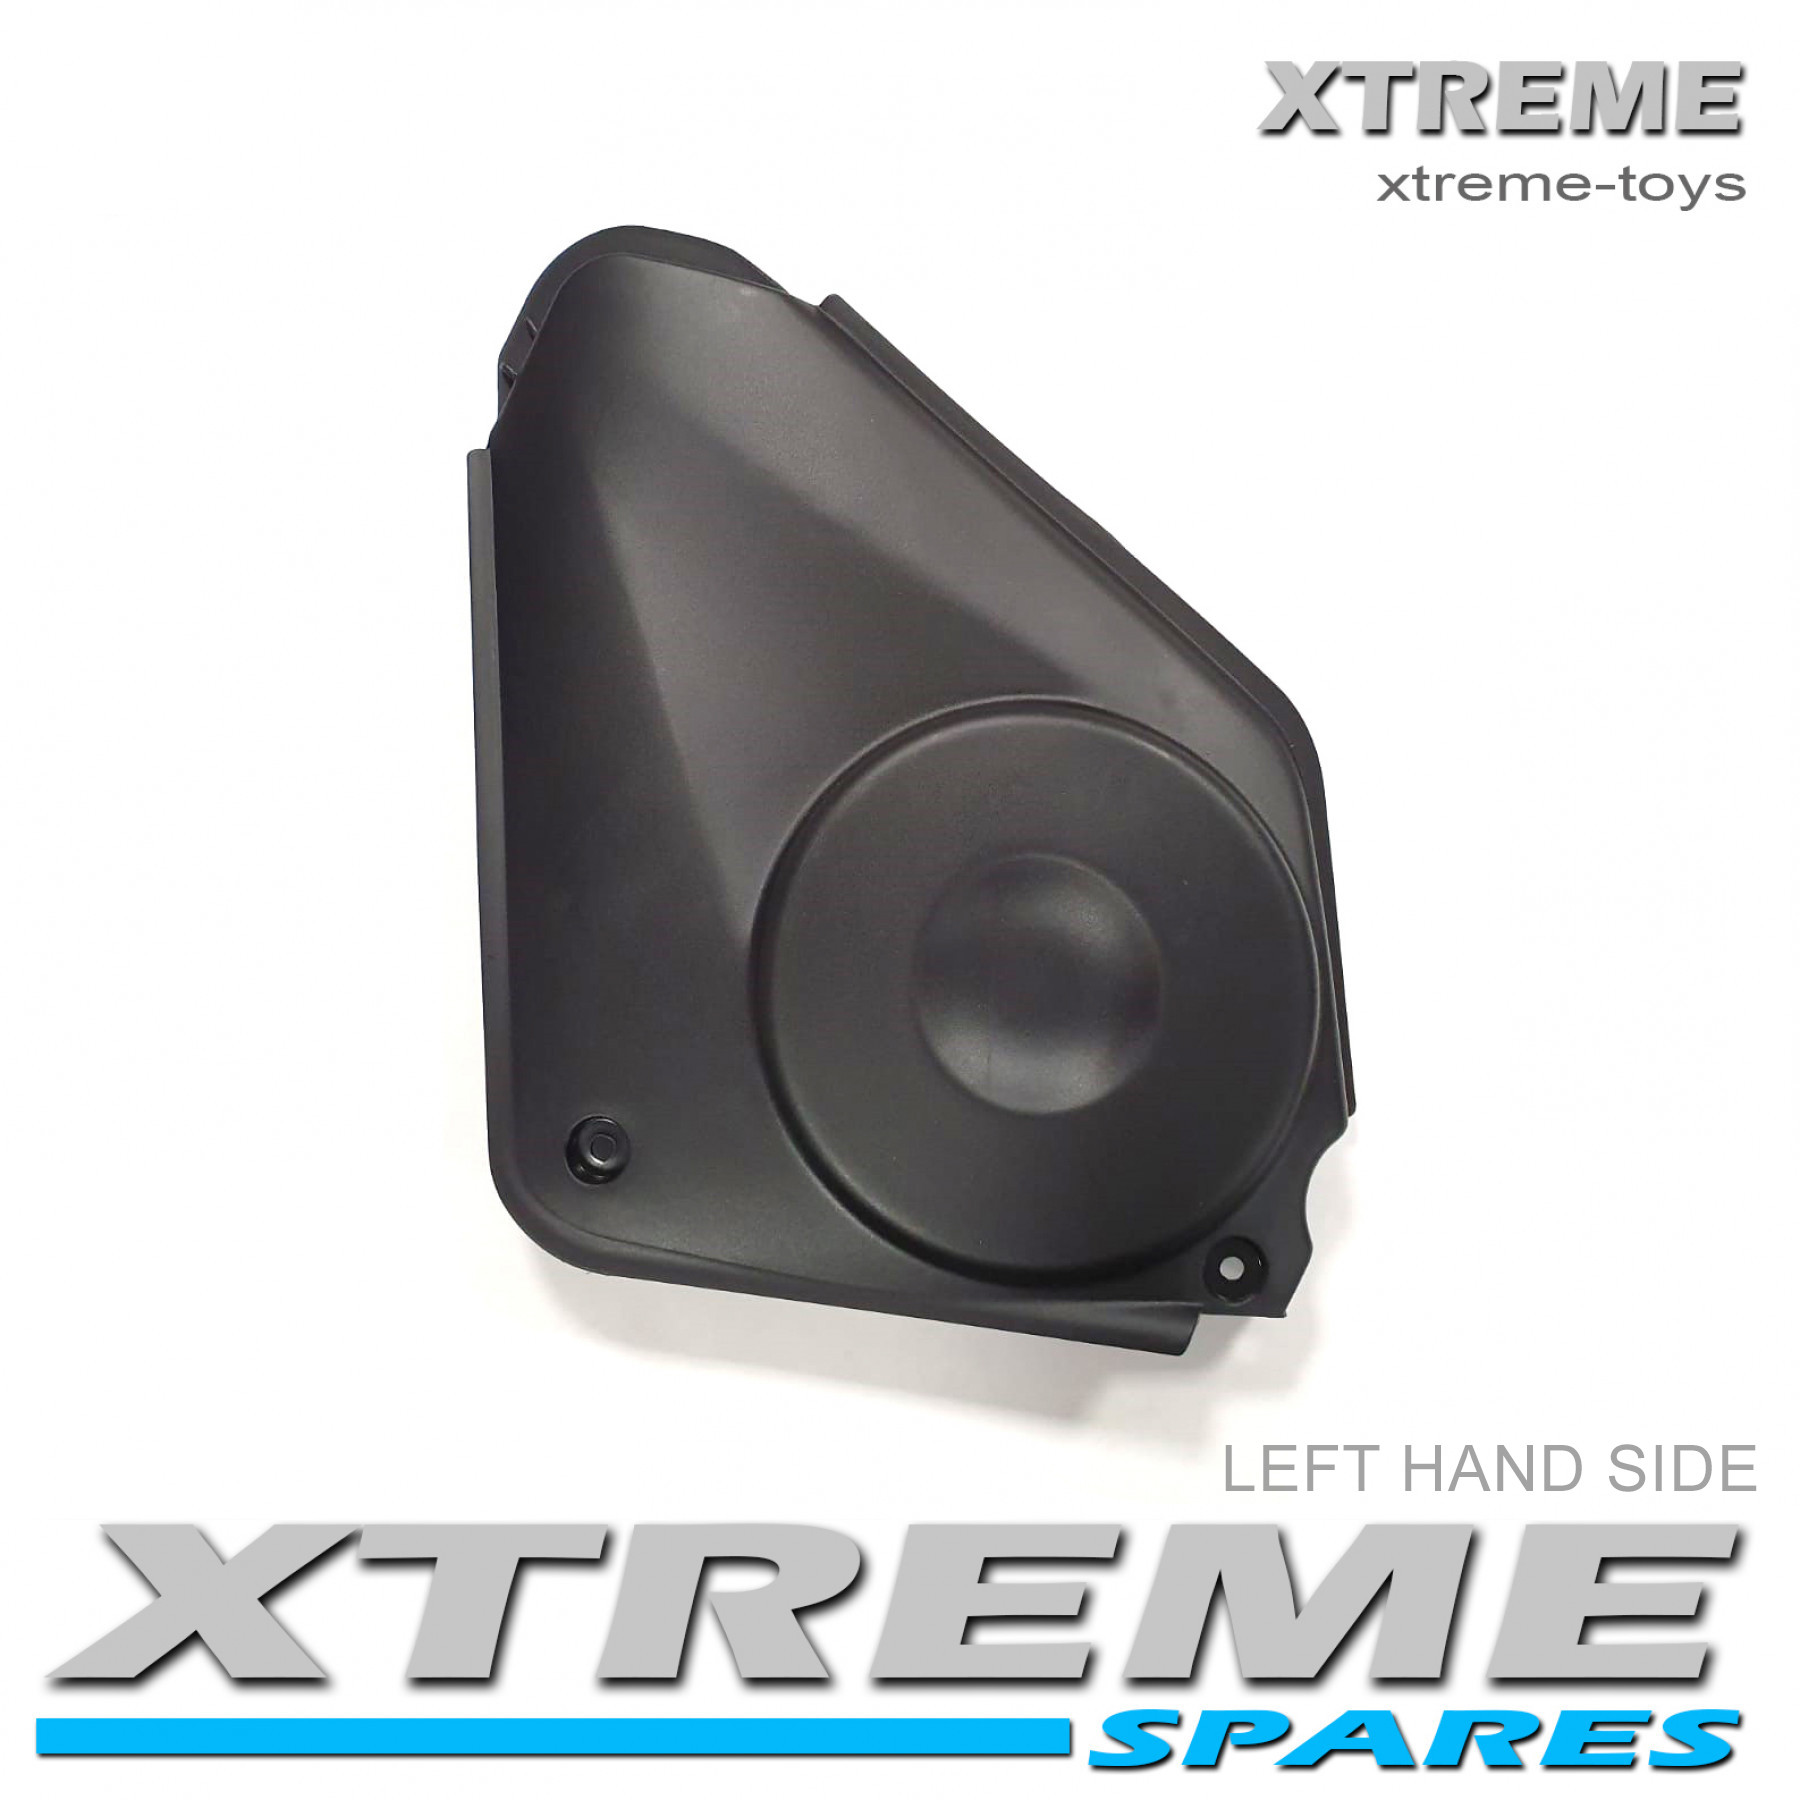 XTREME ELECTRIC XTM MX-PRO REPLACEMENT MOTOR CASE